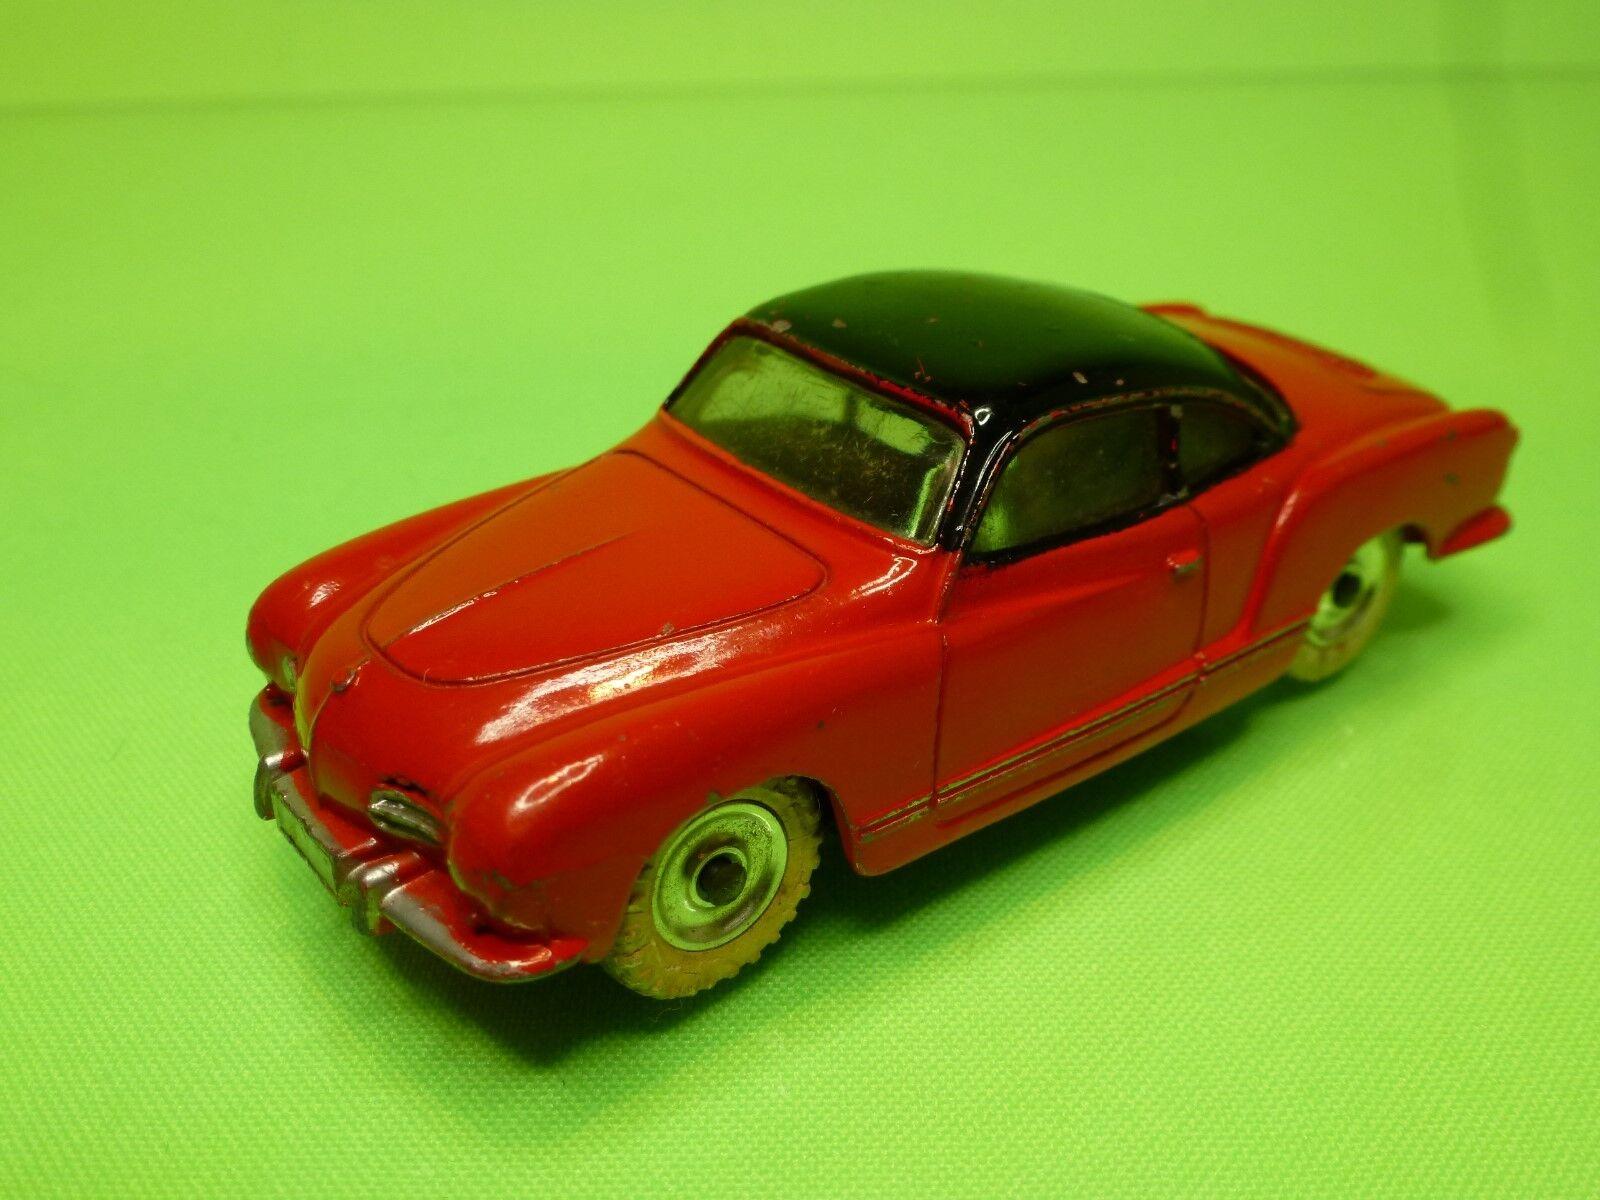 DINKY TOYS TOYS TOYS - 1 43 - NO= 187 VW VOLKSWAGEN KARMANN GHIA   - VERY GOOD  CONDITION 391787